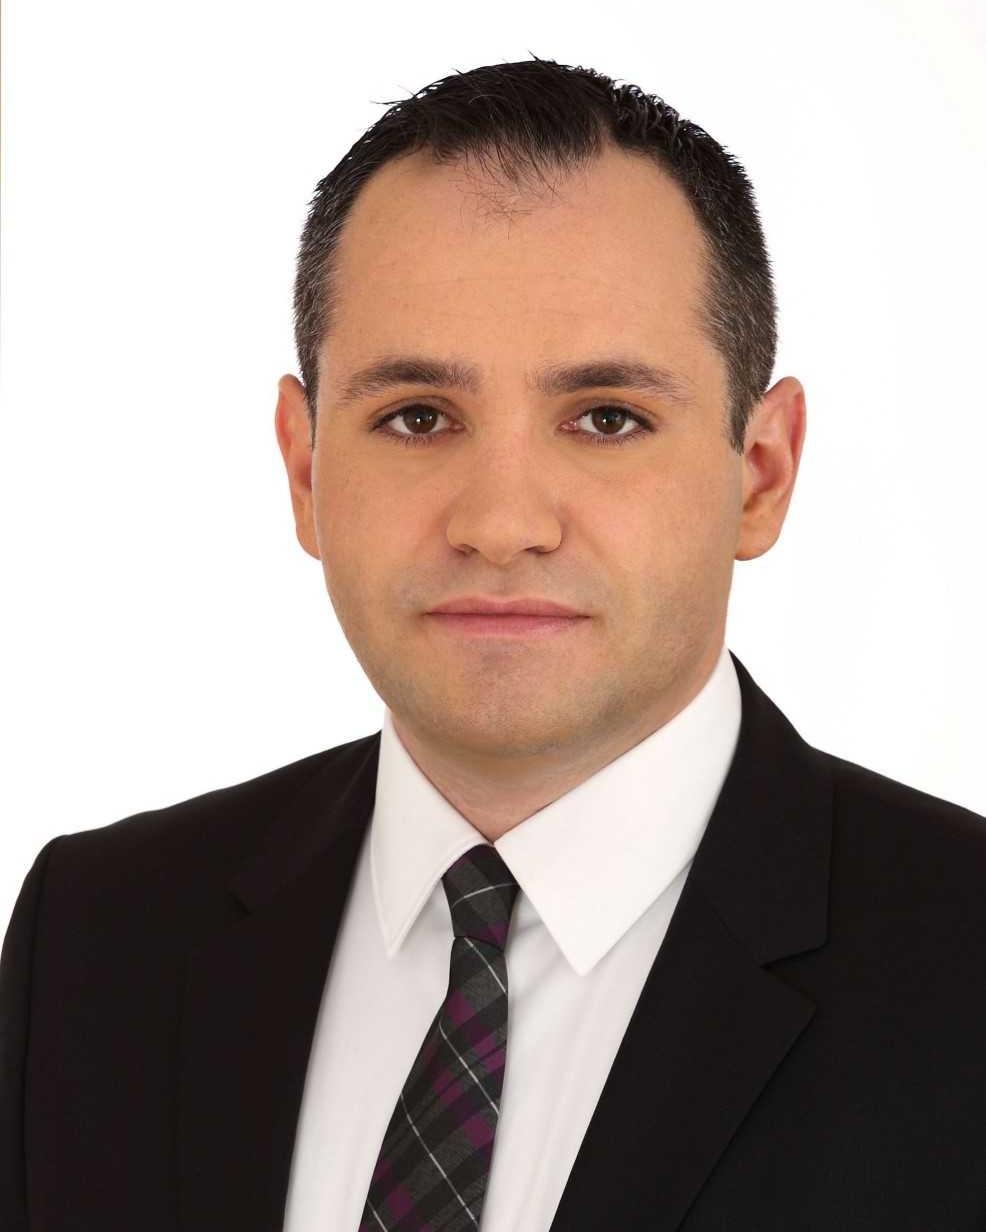 Martin Atzler  Senior Expert  martin.atzler at finbridge.de  +49 151 5806 2812   LinkedIn  |  Xing